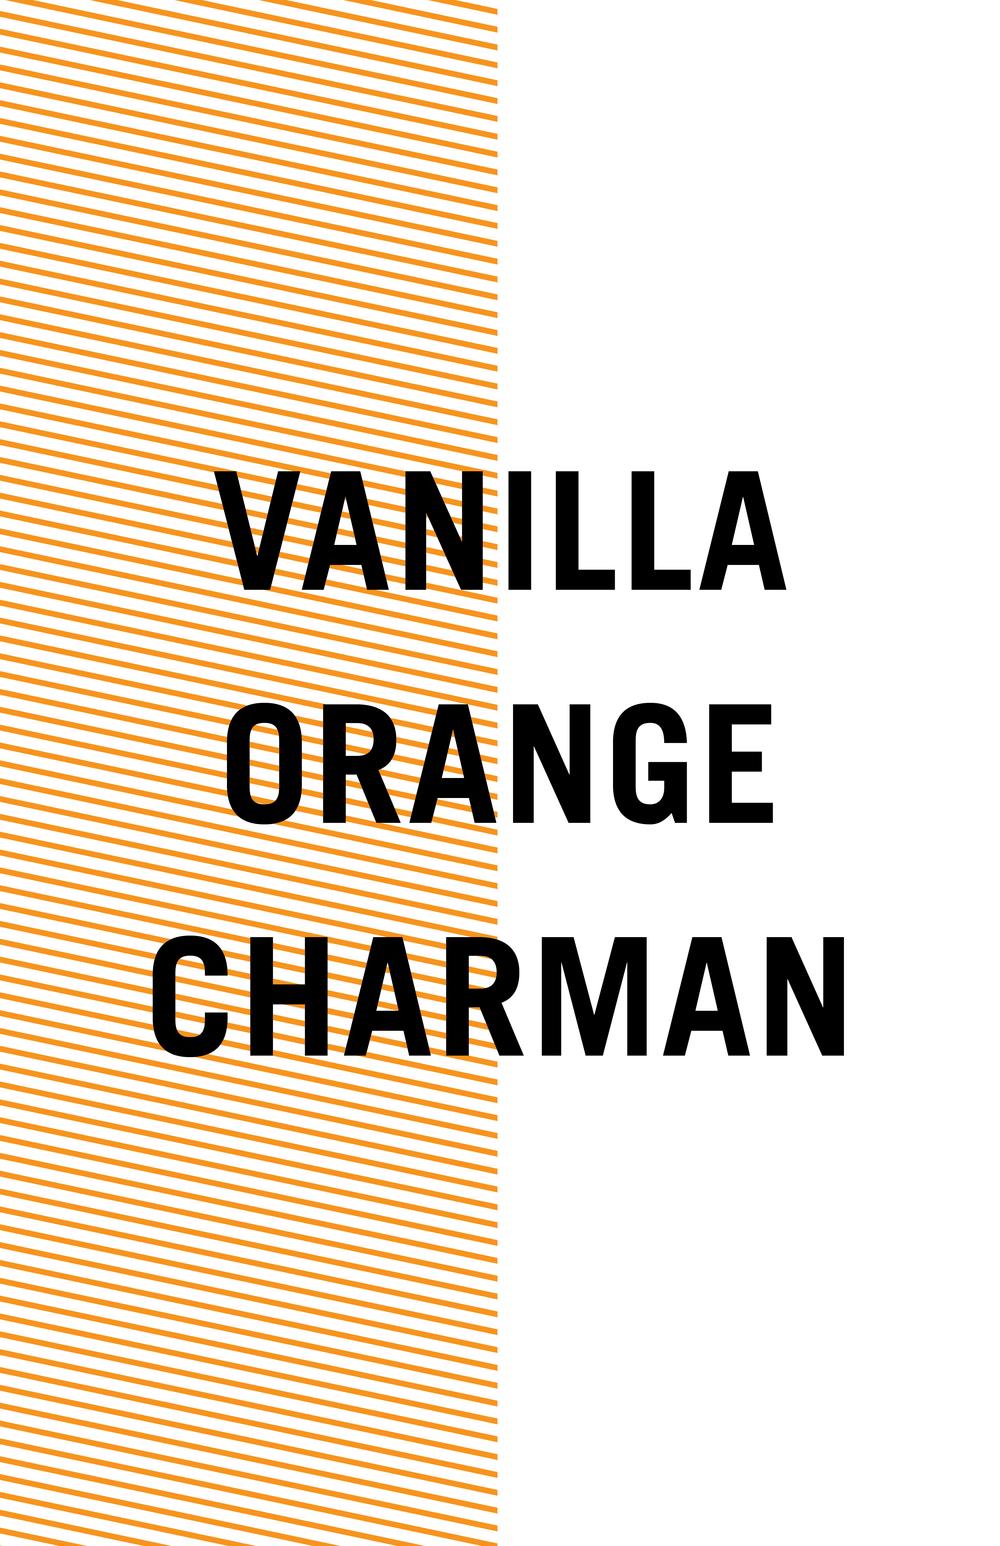 VanillaCharman-03.png